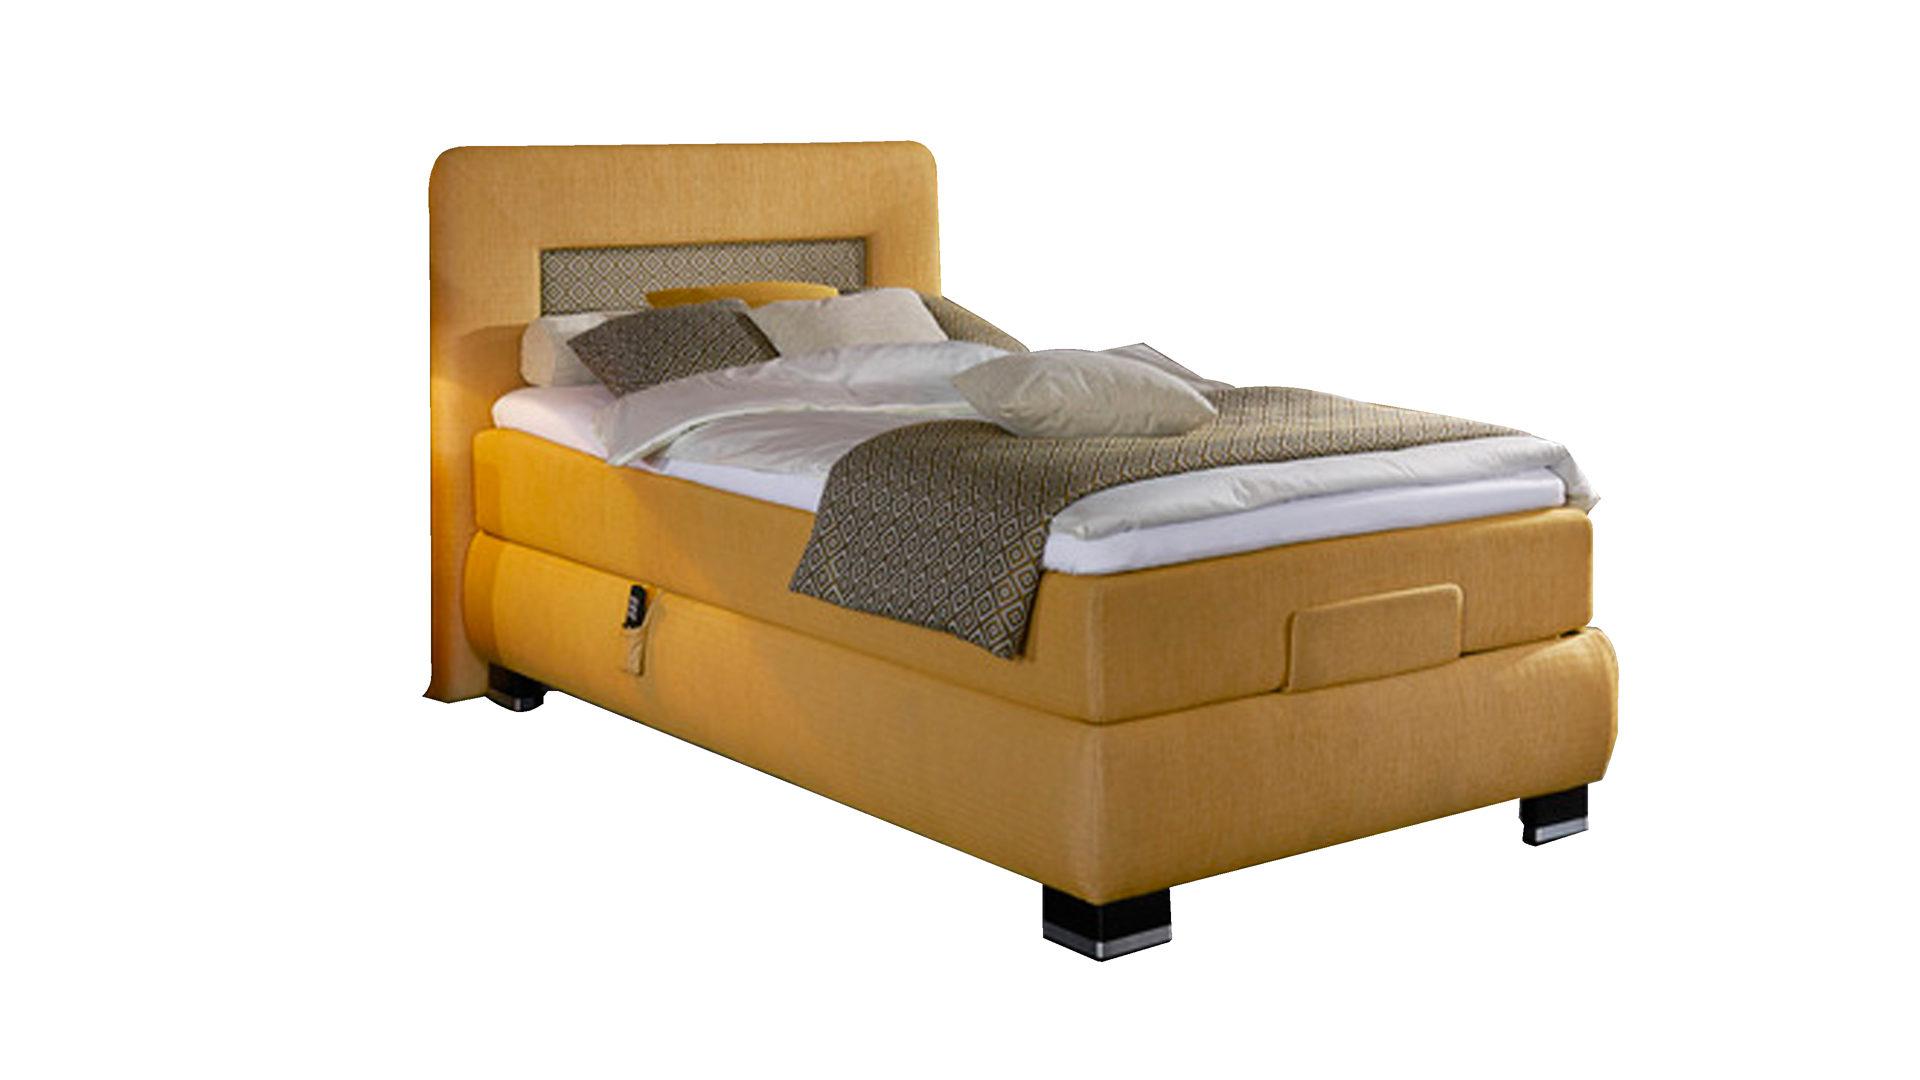 Hertel Möbel e.K. Gesees, Räume, Schlafzimmer, Betten, Comfortmaster ...